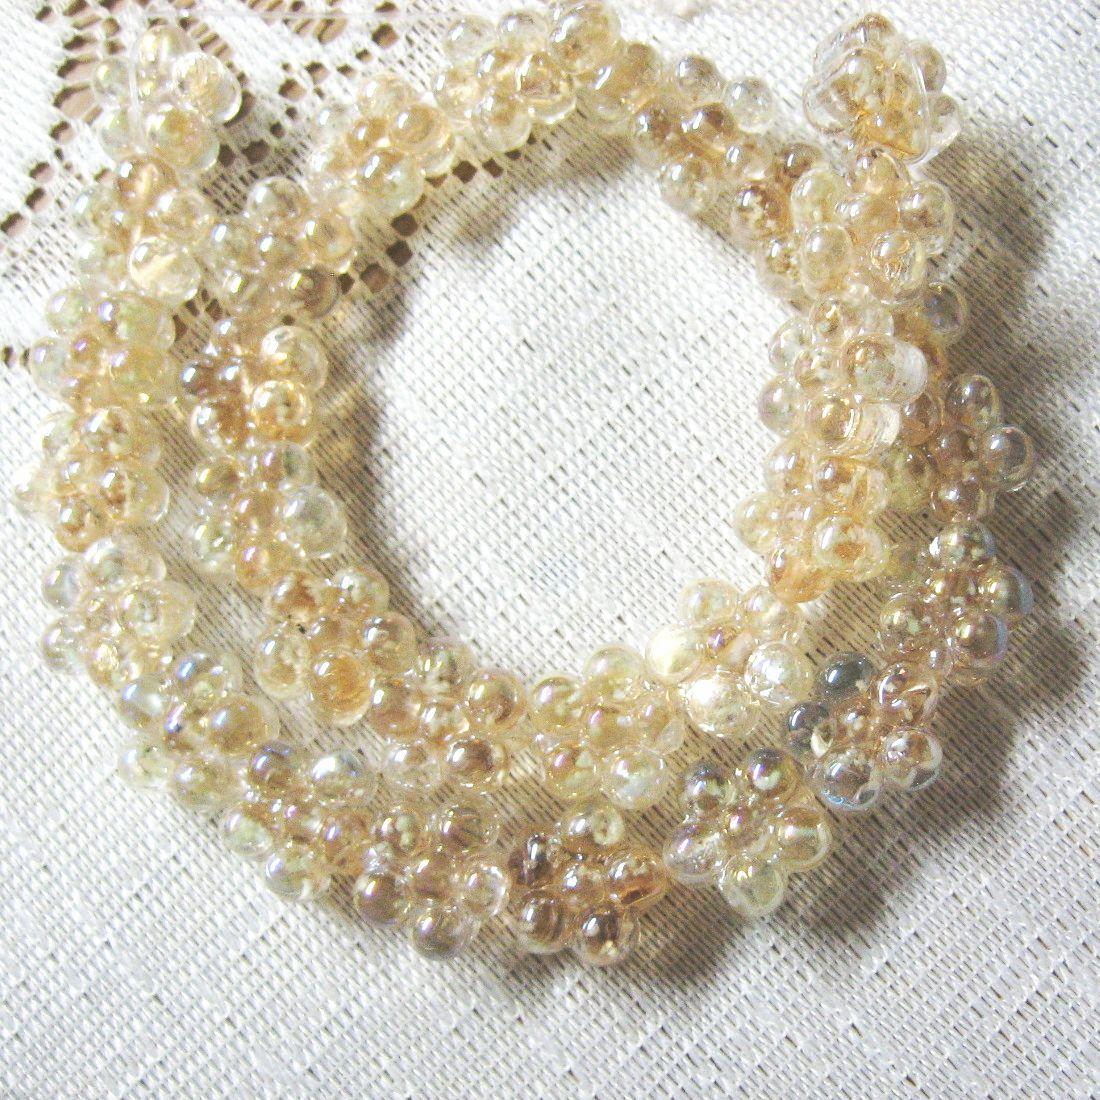 Glass Flower Beads Light Topaz, AB Finish 15mm, 9 beads image 3